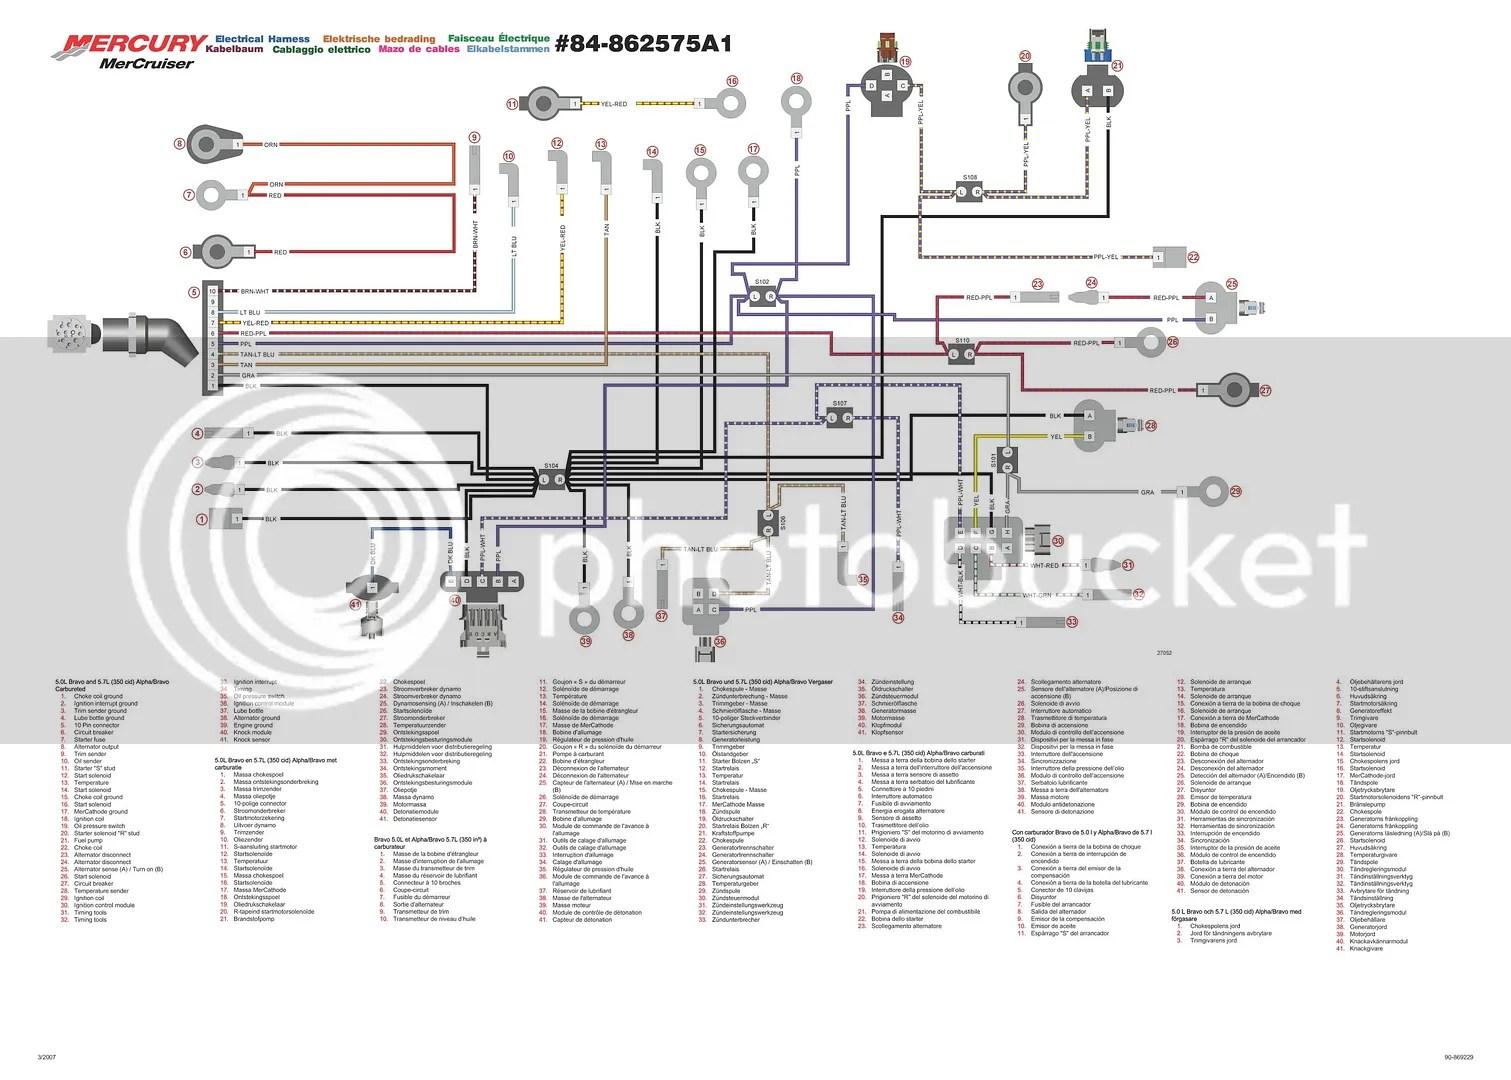 mercury thunderbolt iv ignition wiring emergency key  mercruiser thunderbolt 4 wiring diagram #15